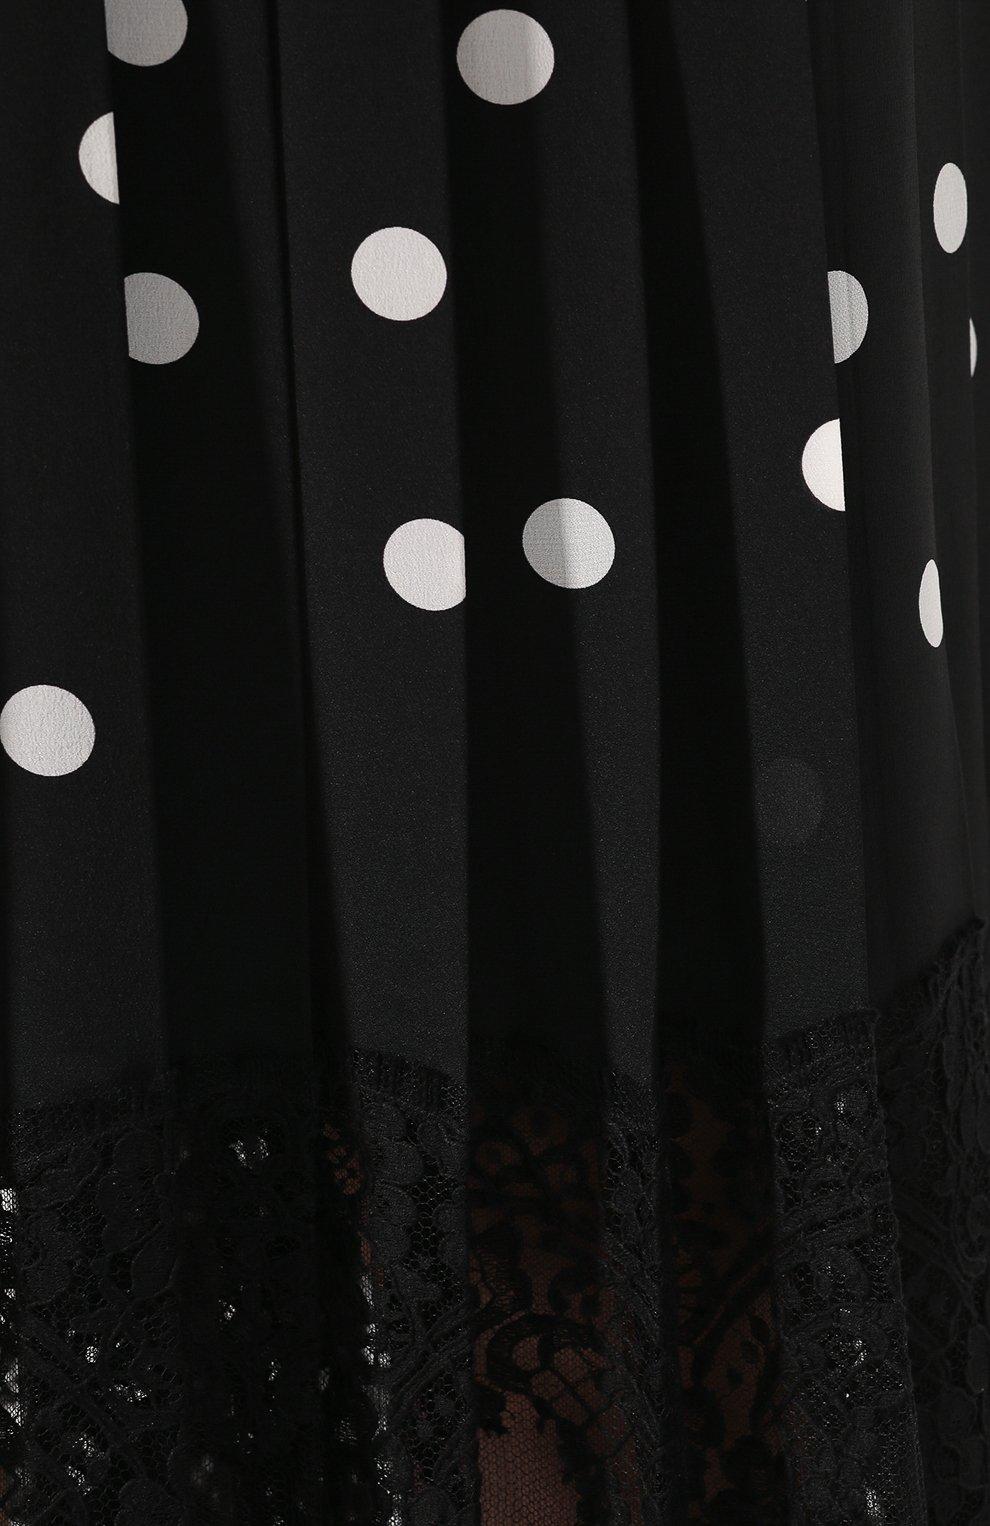 Юбка из смеси шелка и хлопка | Фото №5